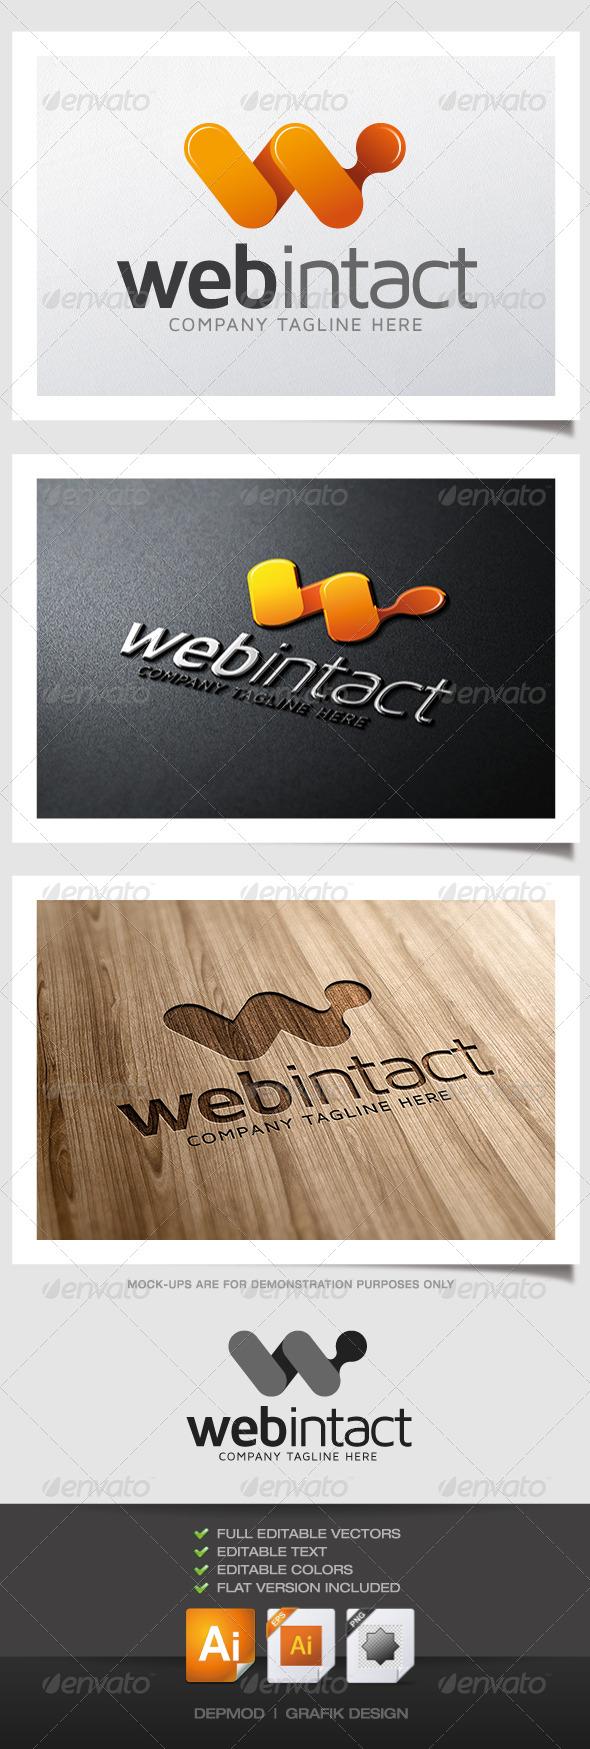 Web Intact Logo